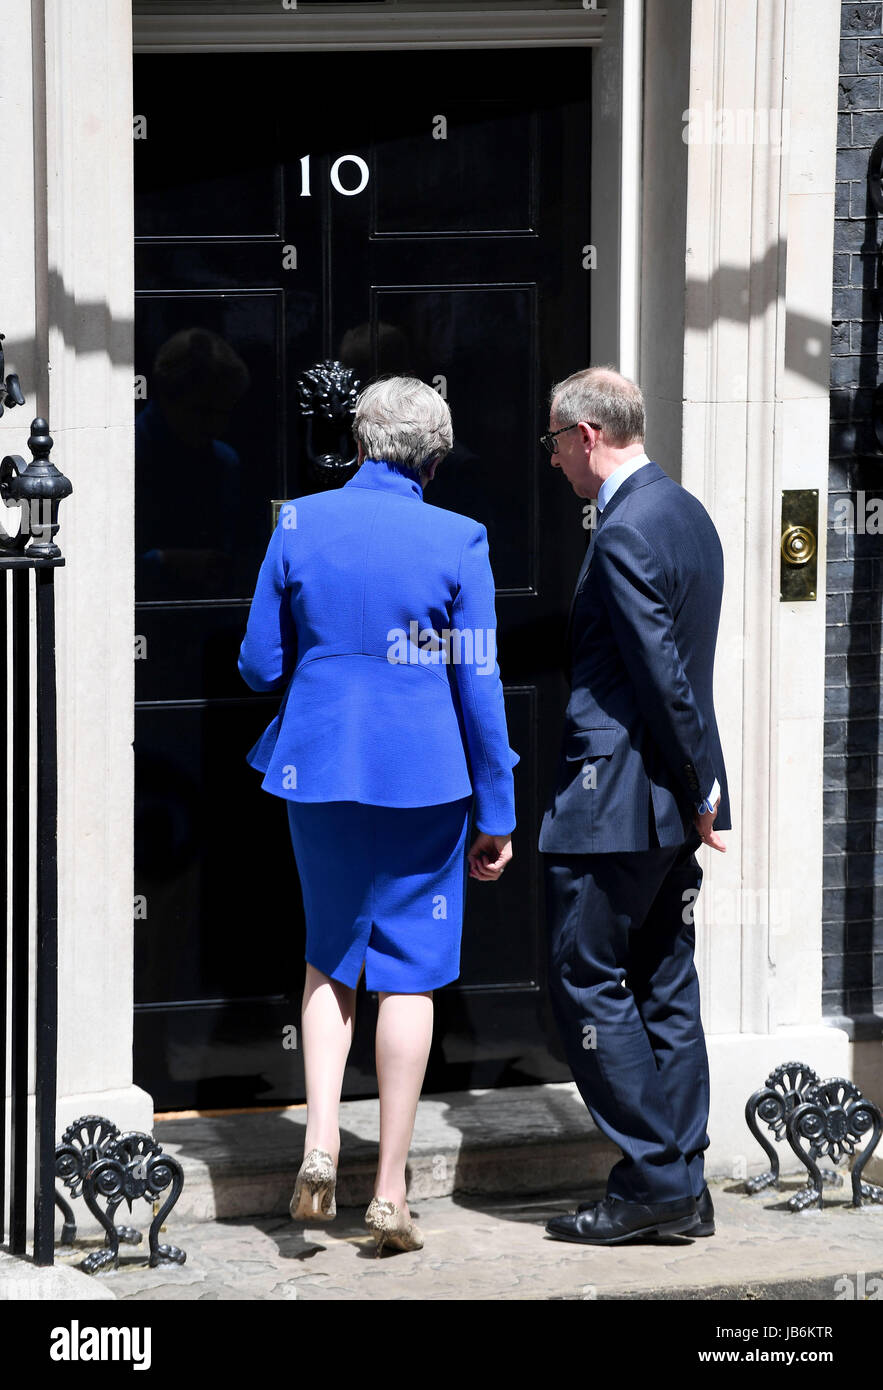 London, UK. 9. Juni 2017. Premierminister Theresa May und Ehemann Phillip Credit: Finnbarr Webster/Alamy Live News Stockbild